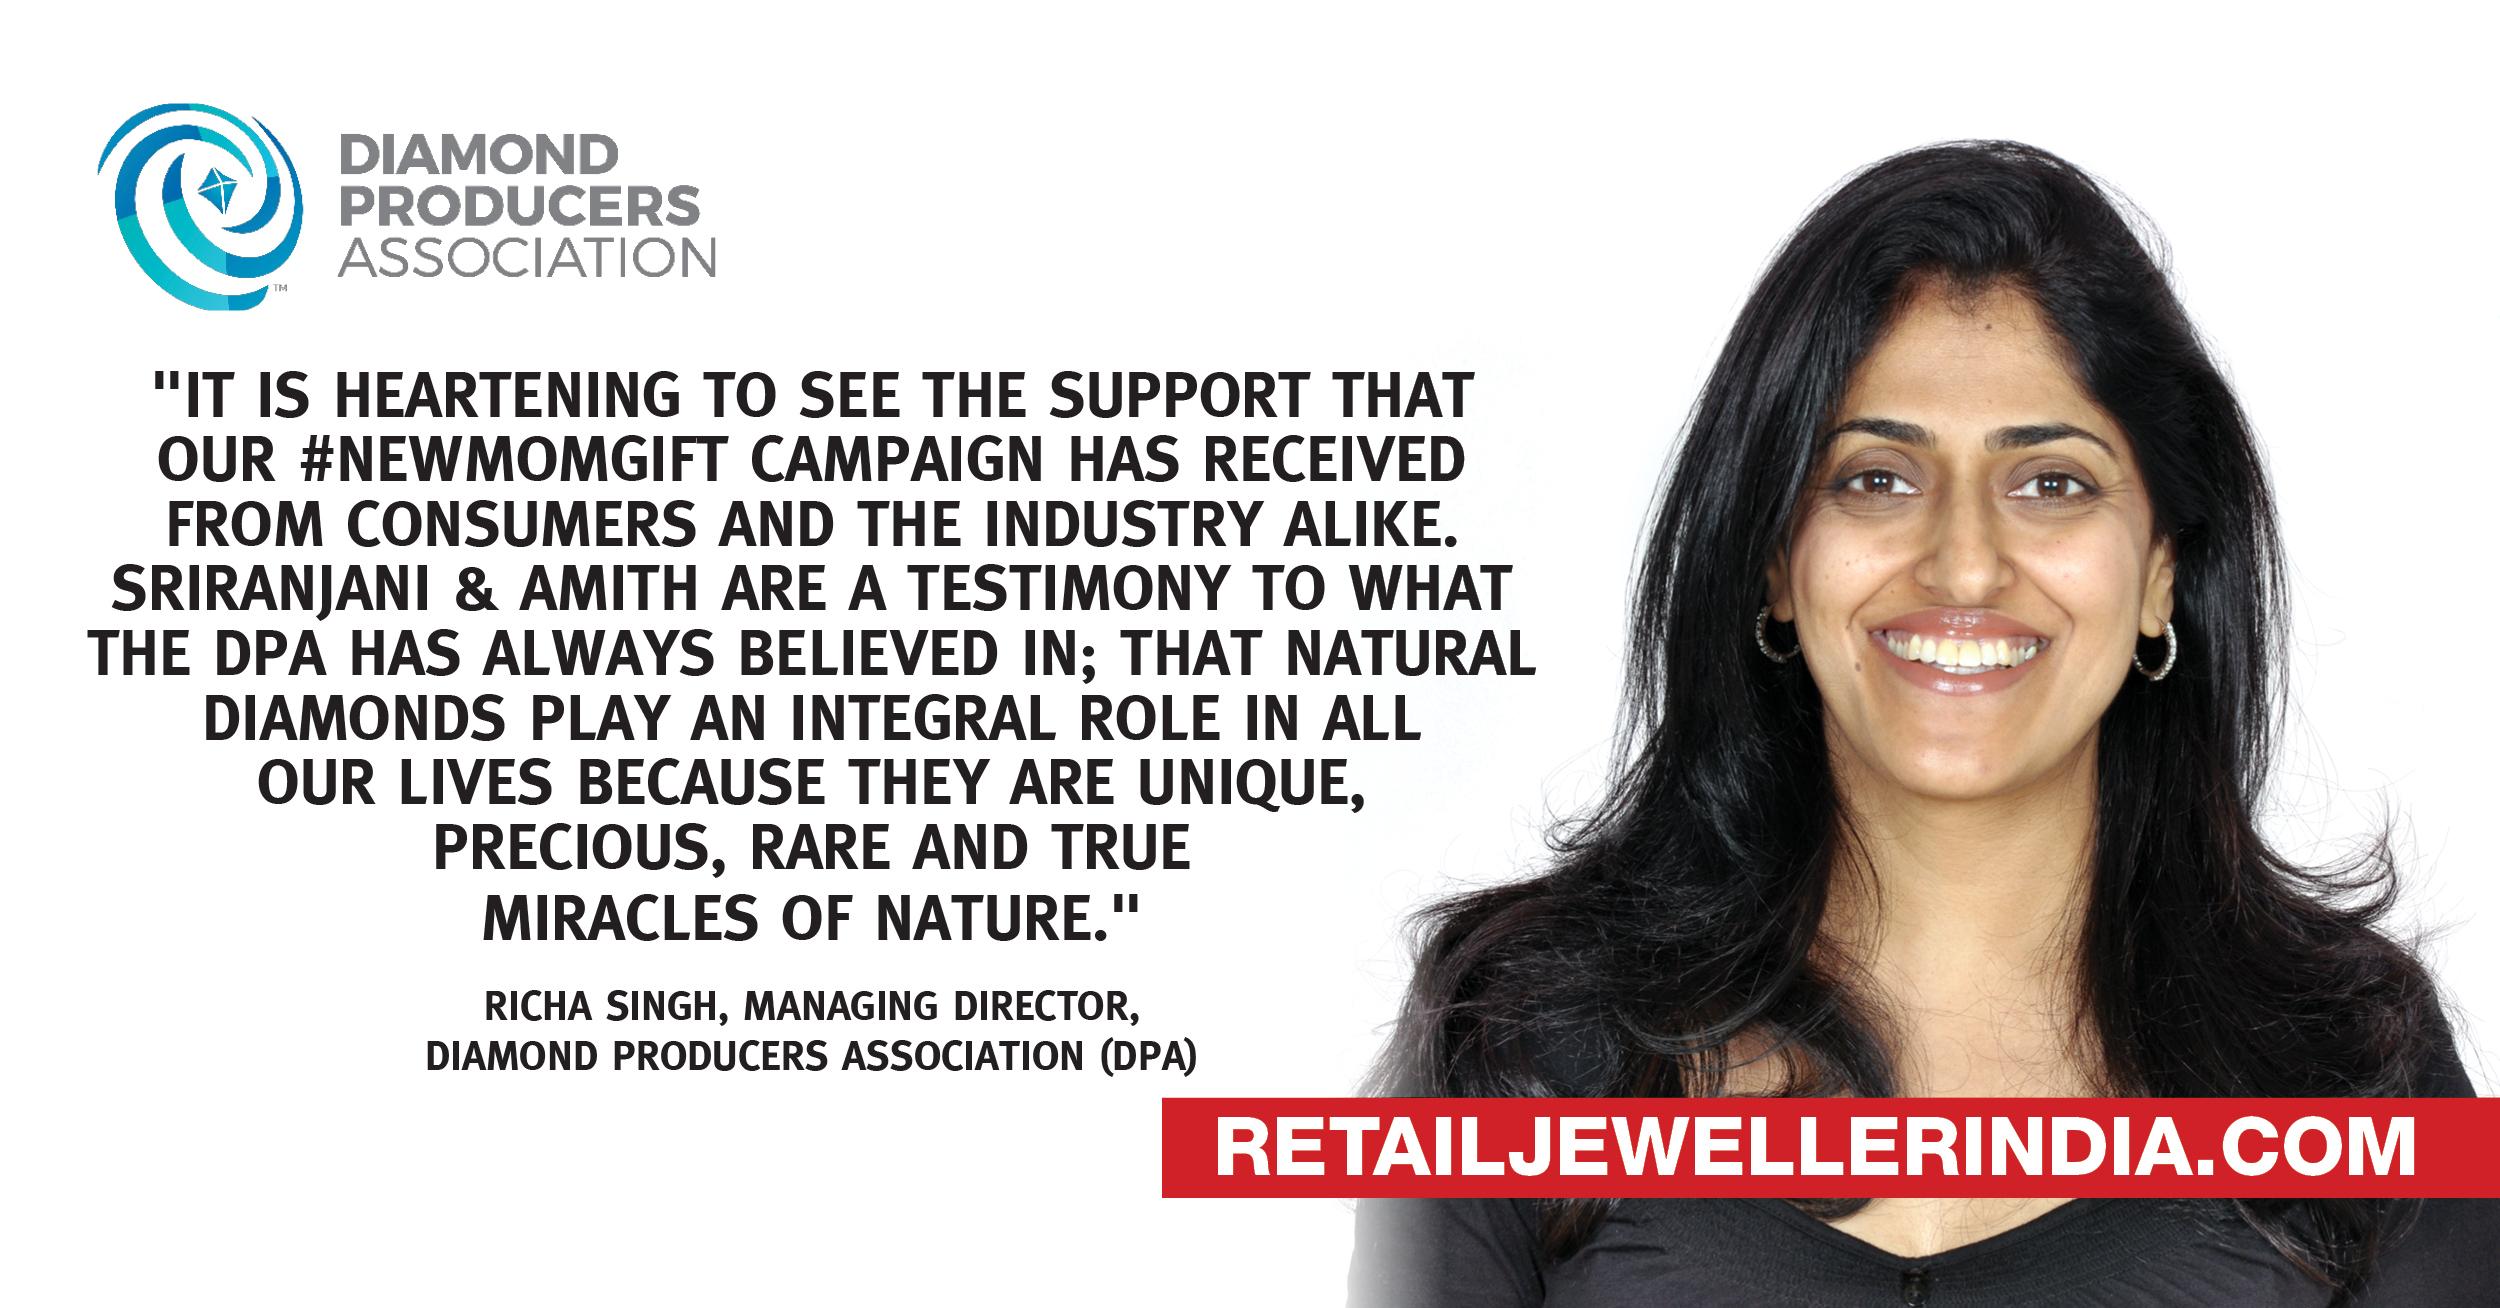 Richa Singh, Managing Director – India, Diamond Producers Association